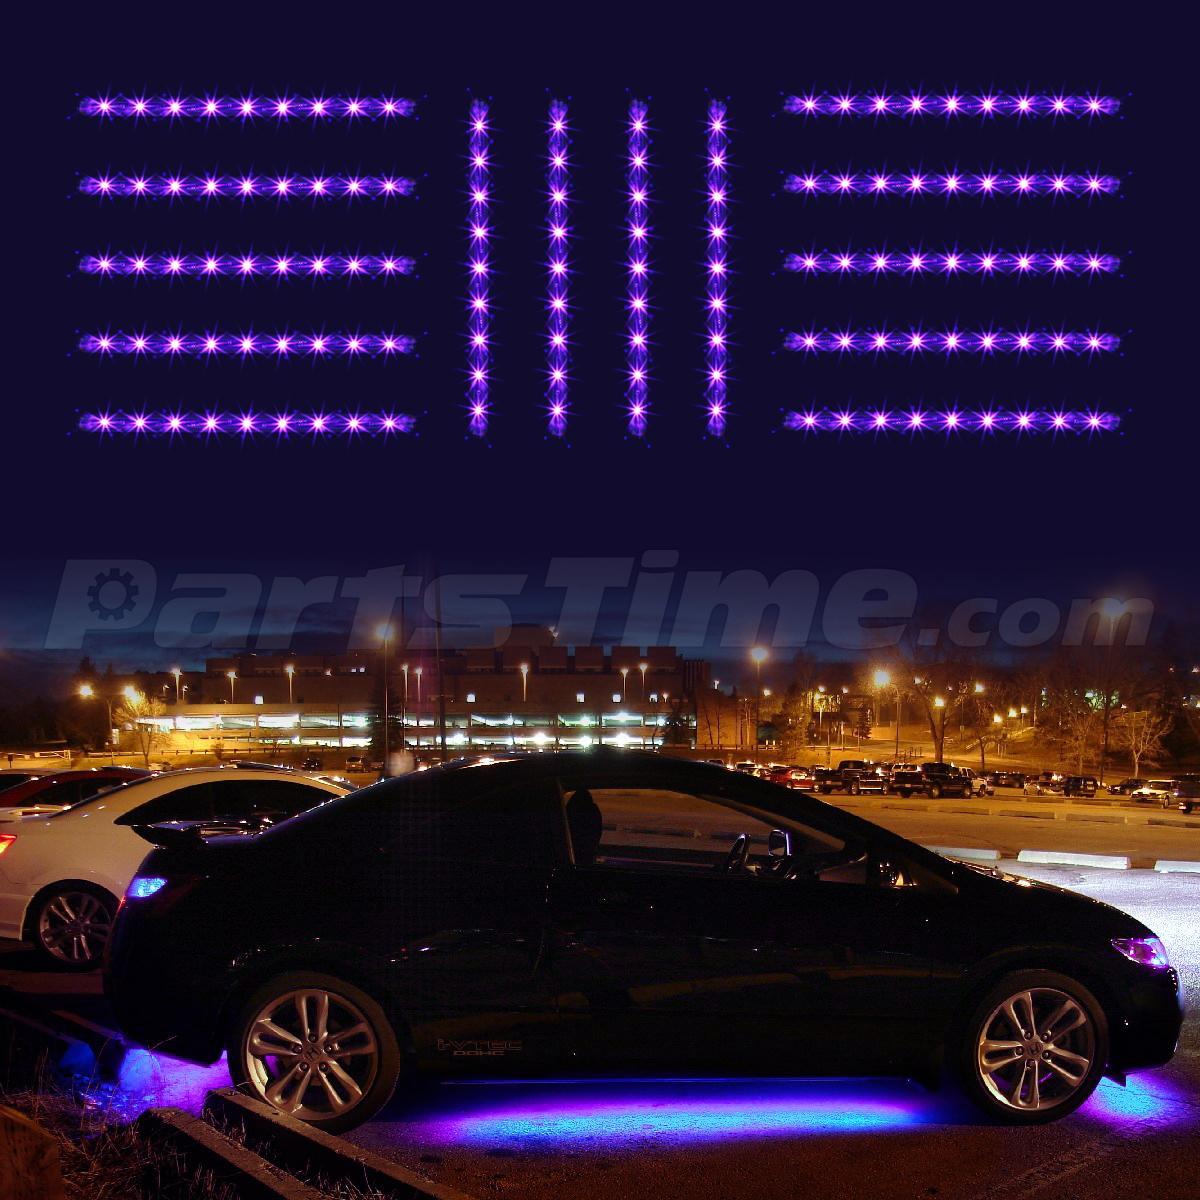 Purple 14pc Car Truck Underglow Under Body Neon Accent Glow LED Lights Kit 3Mode  eBay